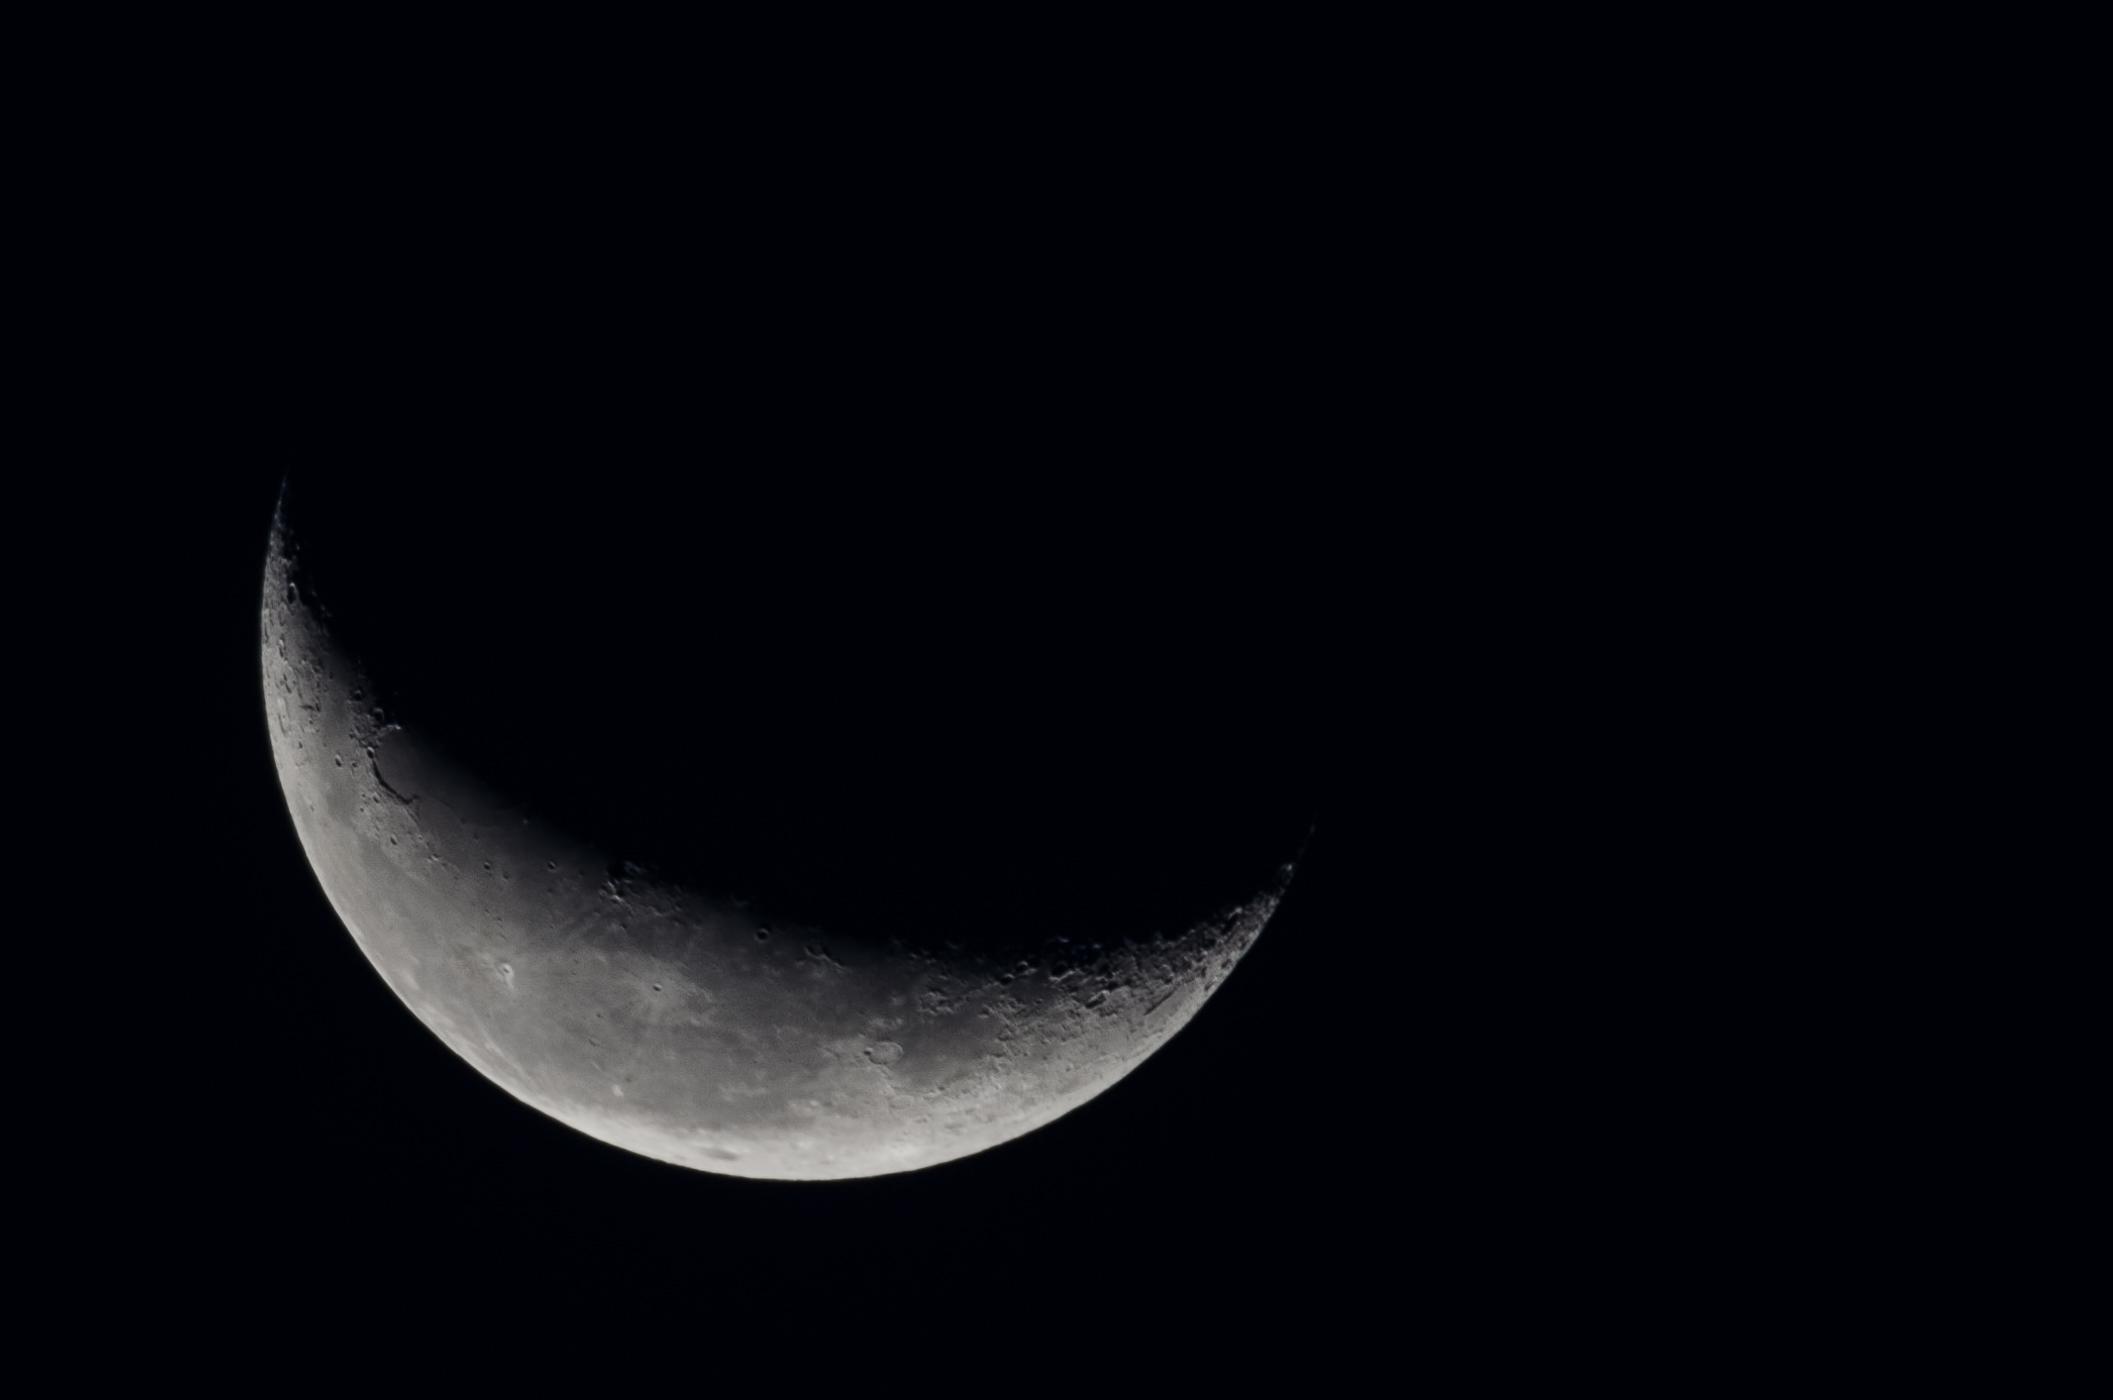 Wanning Moon  Nikon D7000 ISO 200 f/11 1/100 sec. 600mm